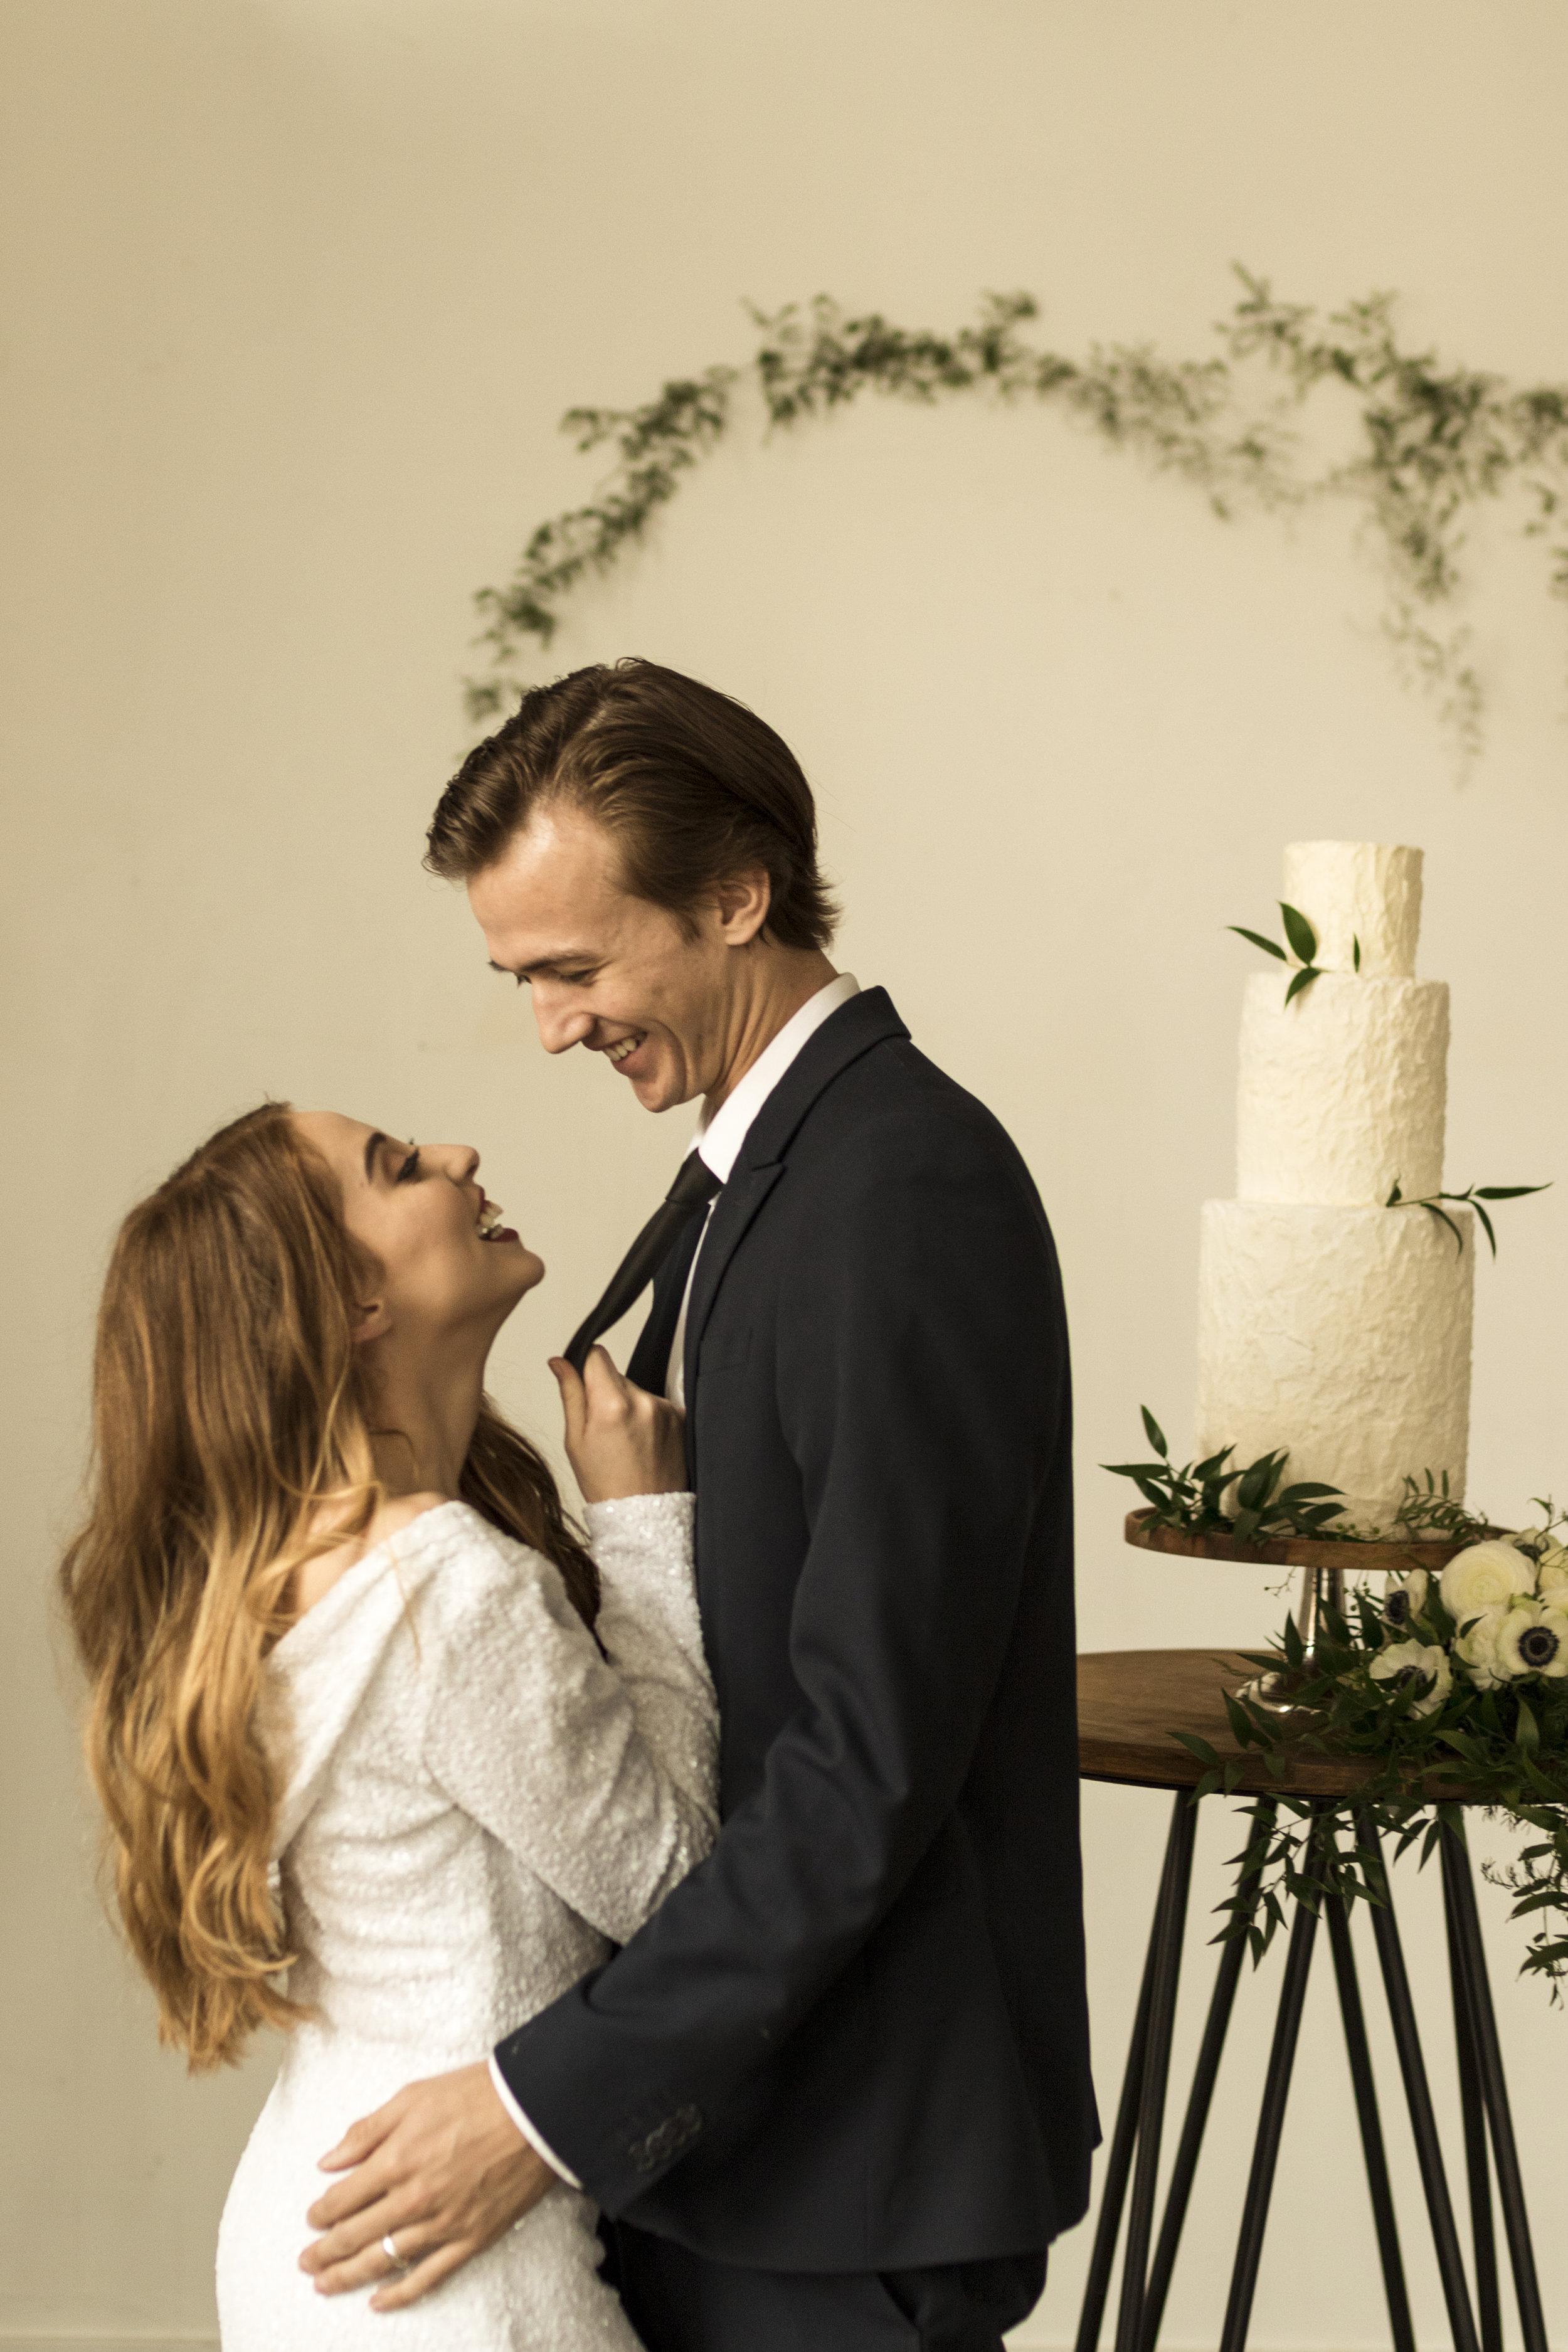 BBPhotodowntown Salt Lake CityUtah Wedding13.JPG